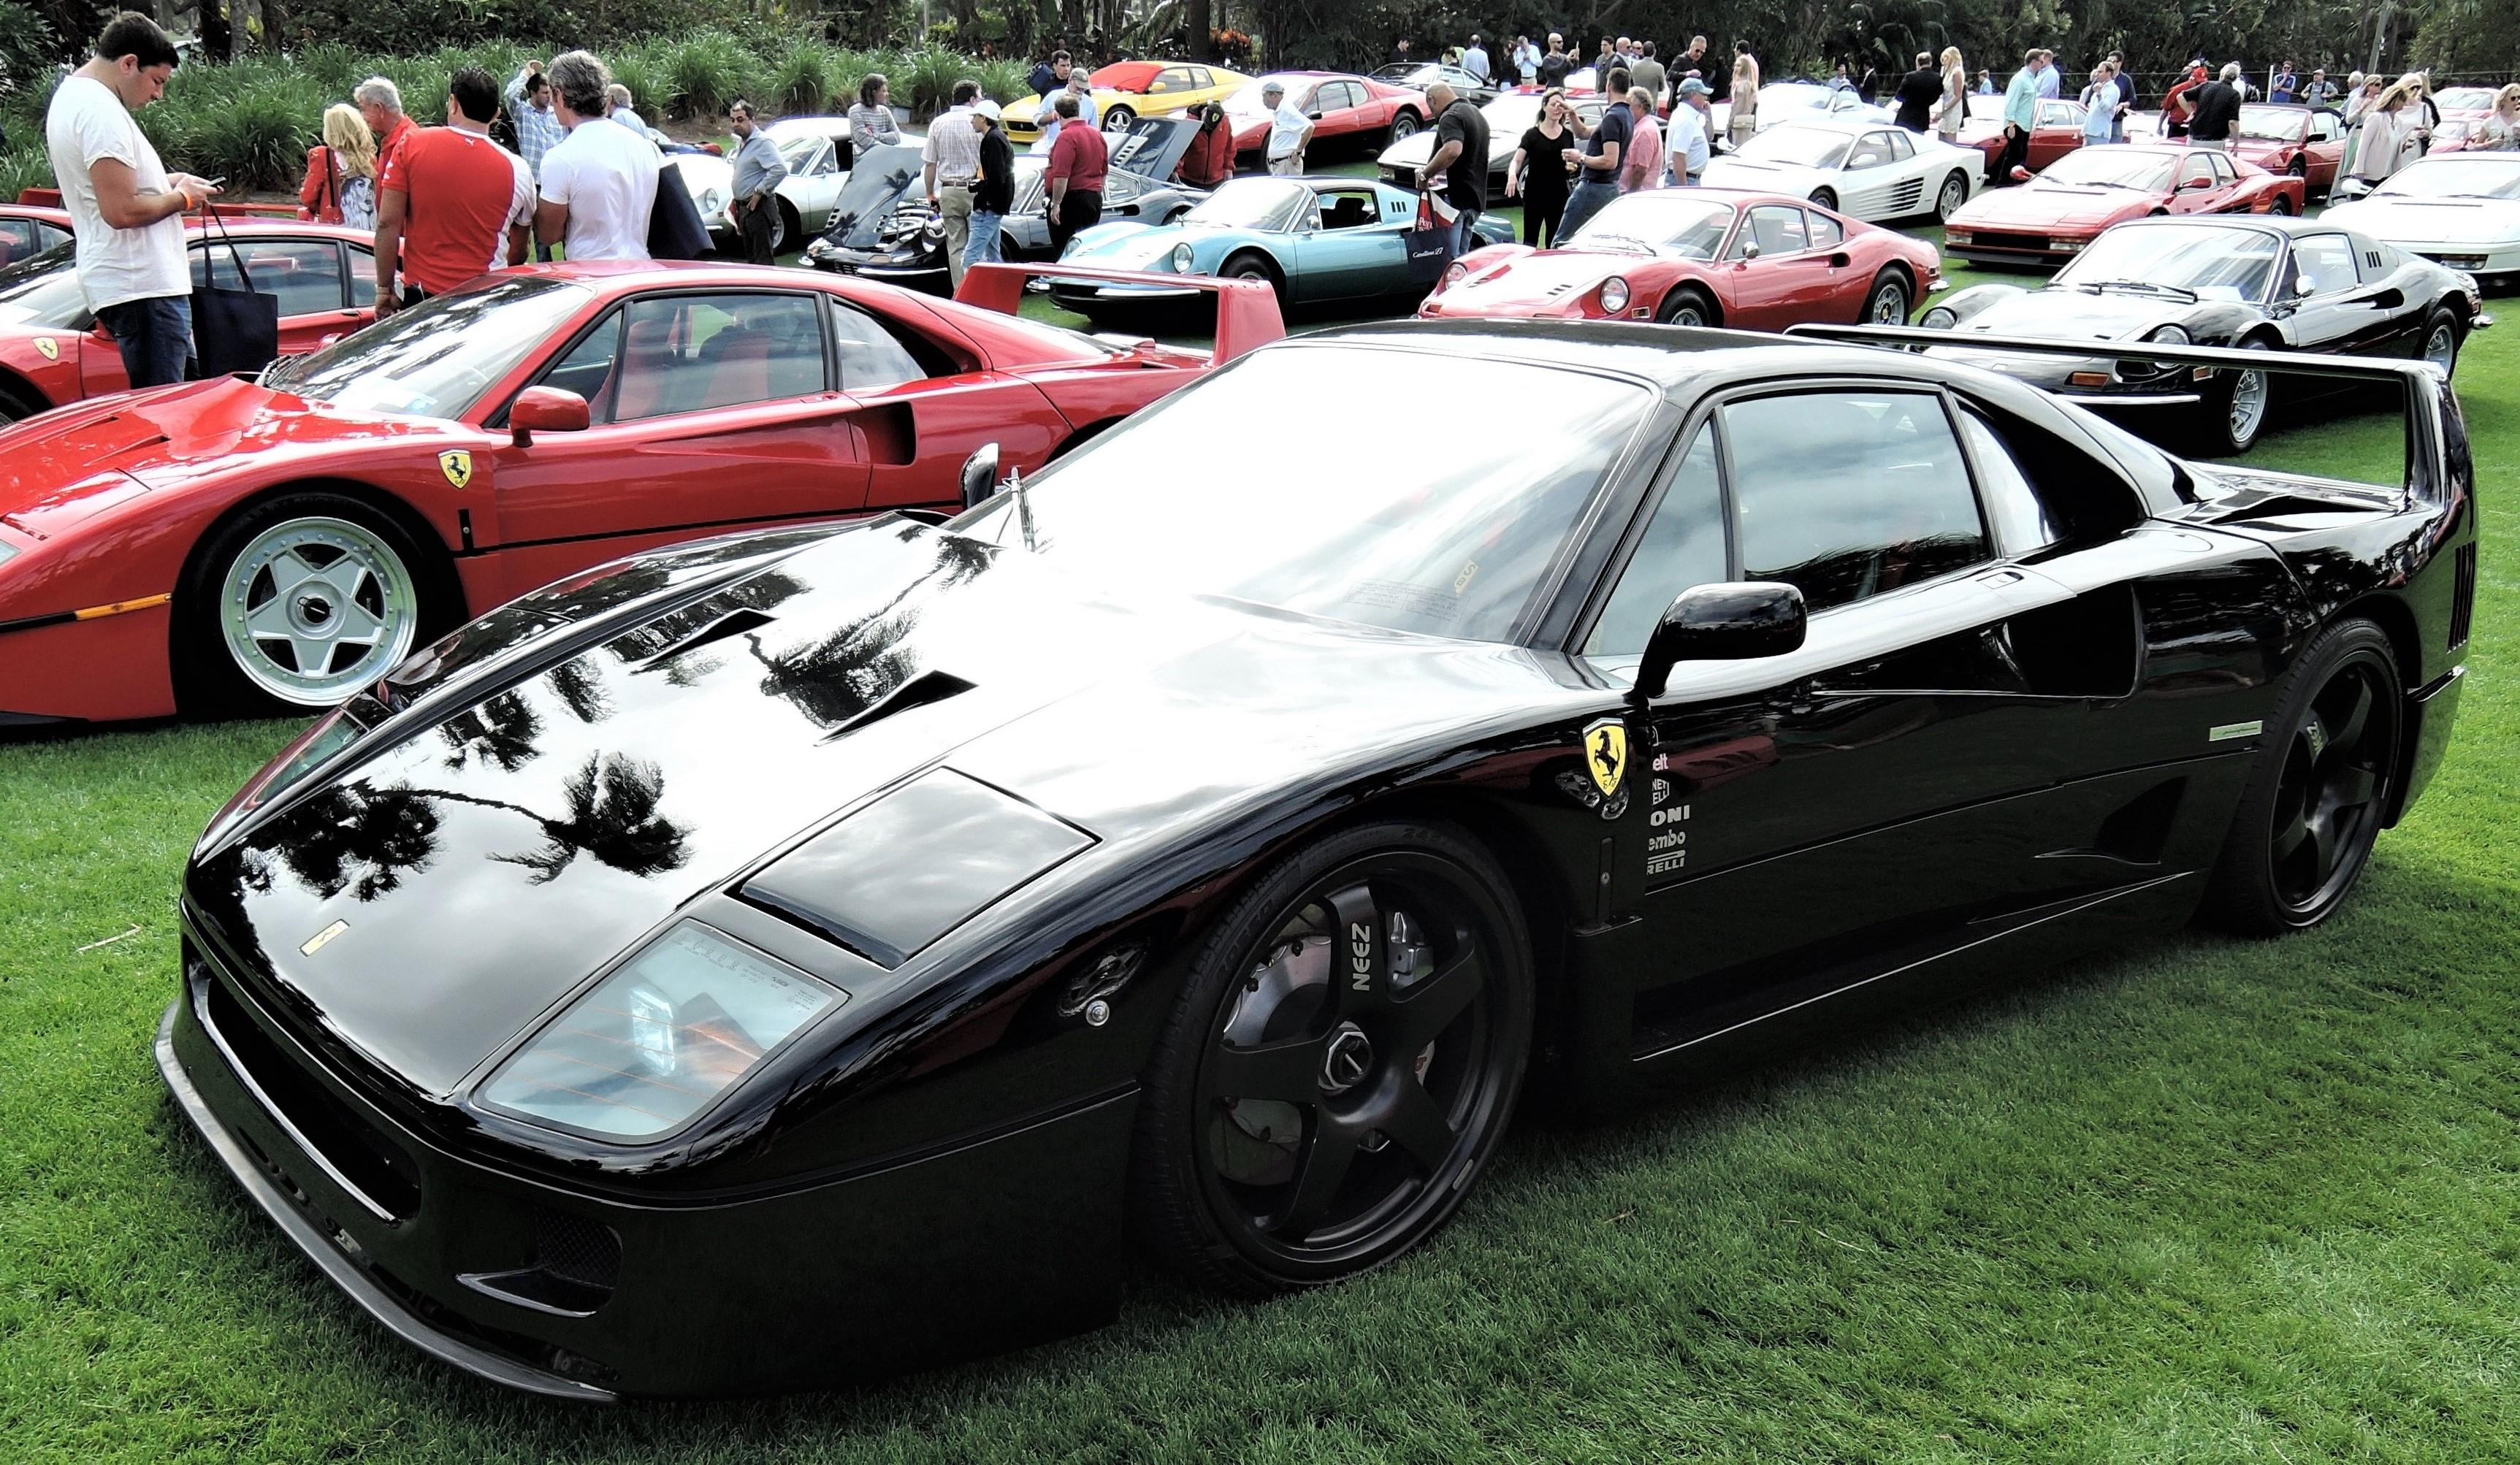 black 1992 Ferrari F40; Sn 501991 - Cavallino 2018 Concours